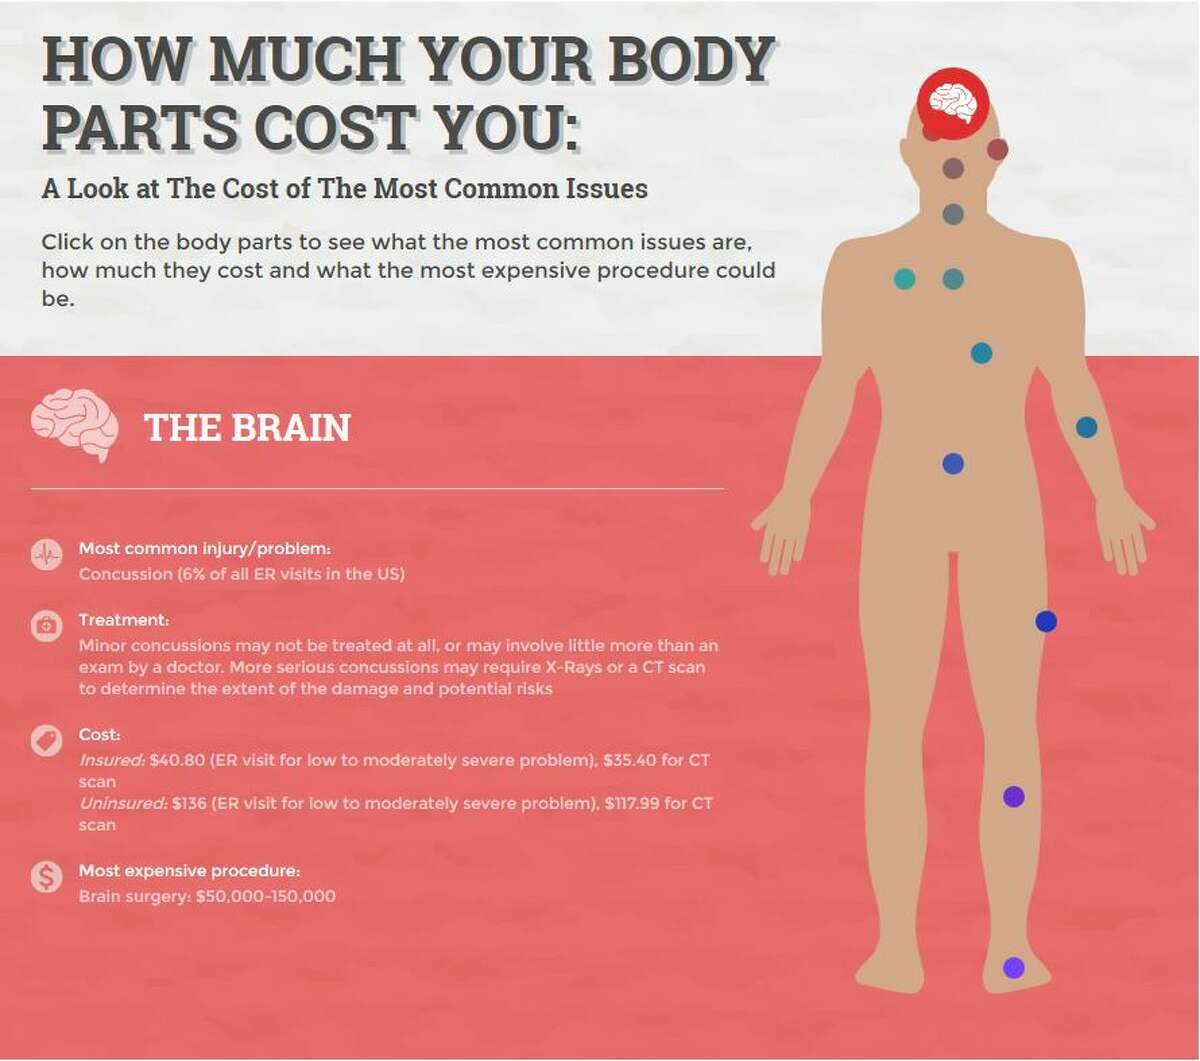 The Brain Most expensive procedure: Brain surgery: $50,000-150,000